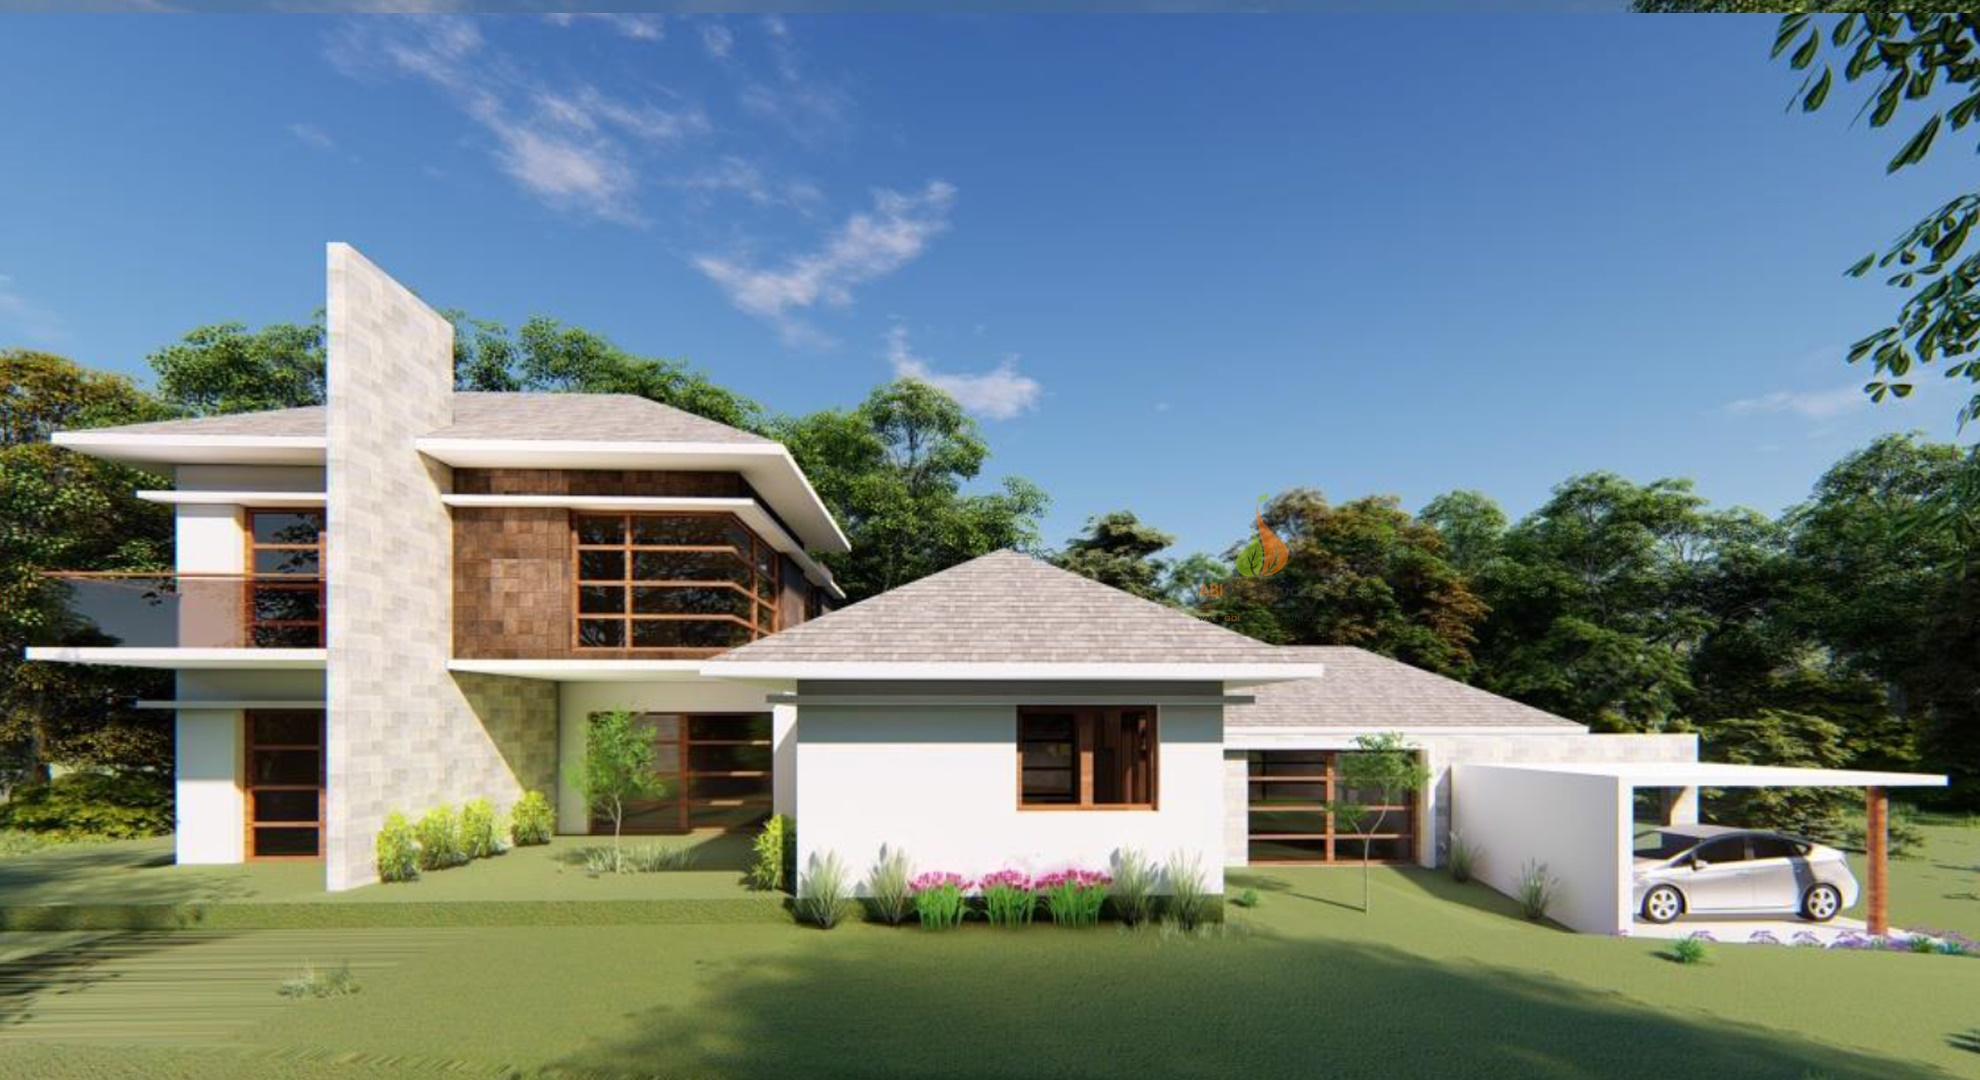 Super luxury villas in Kotagiri